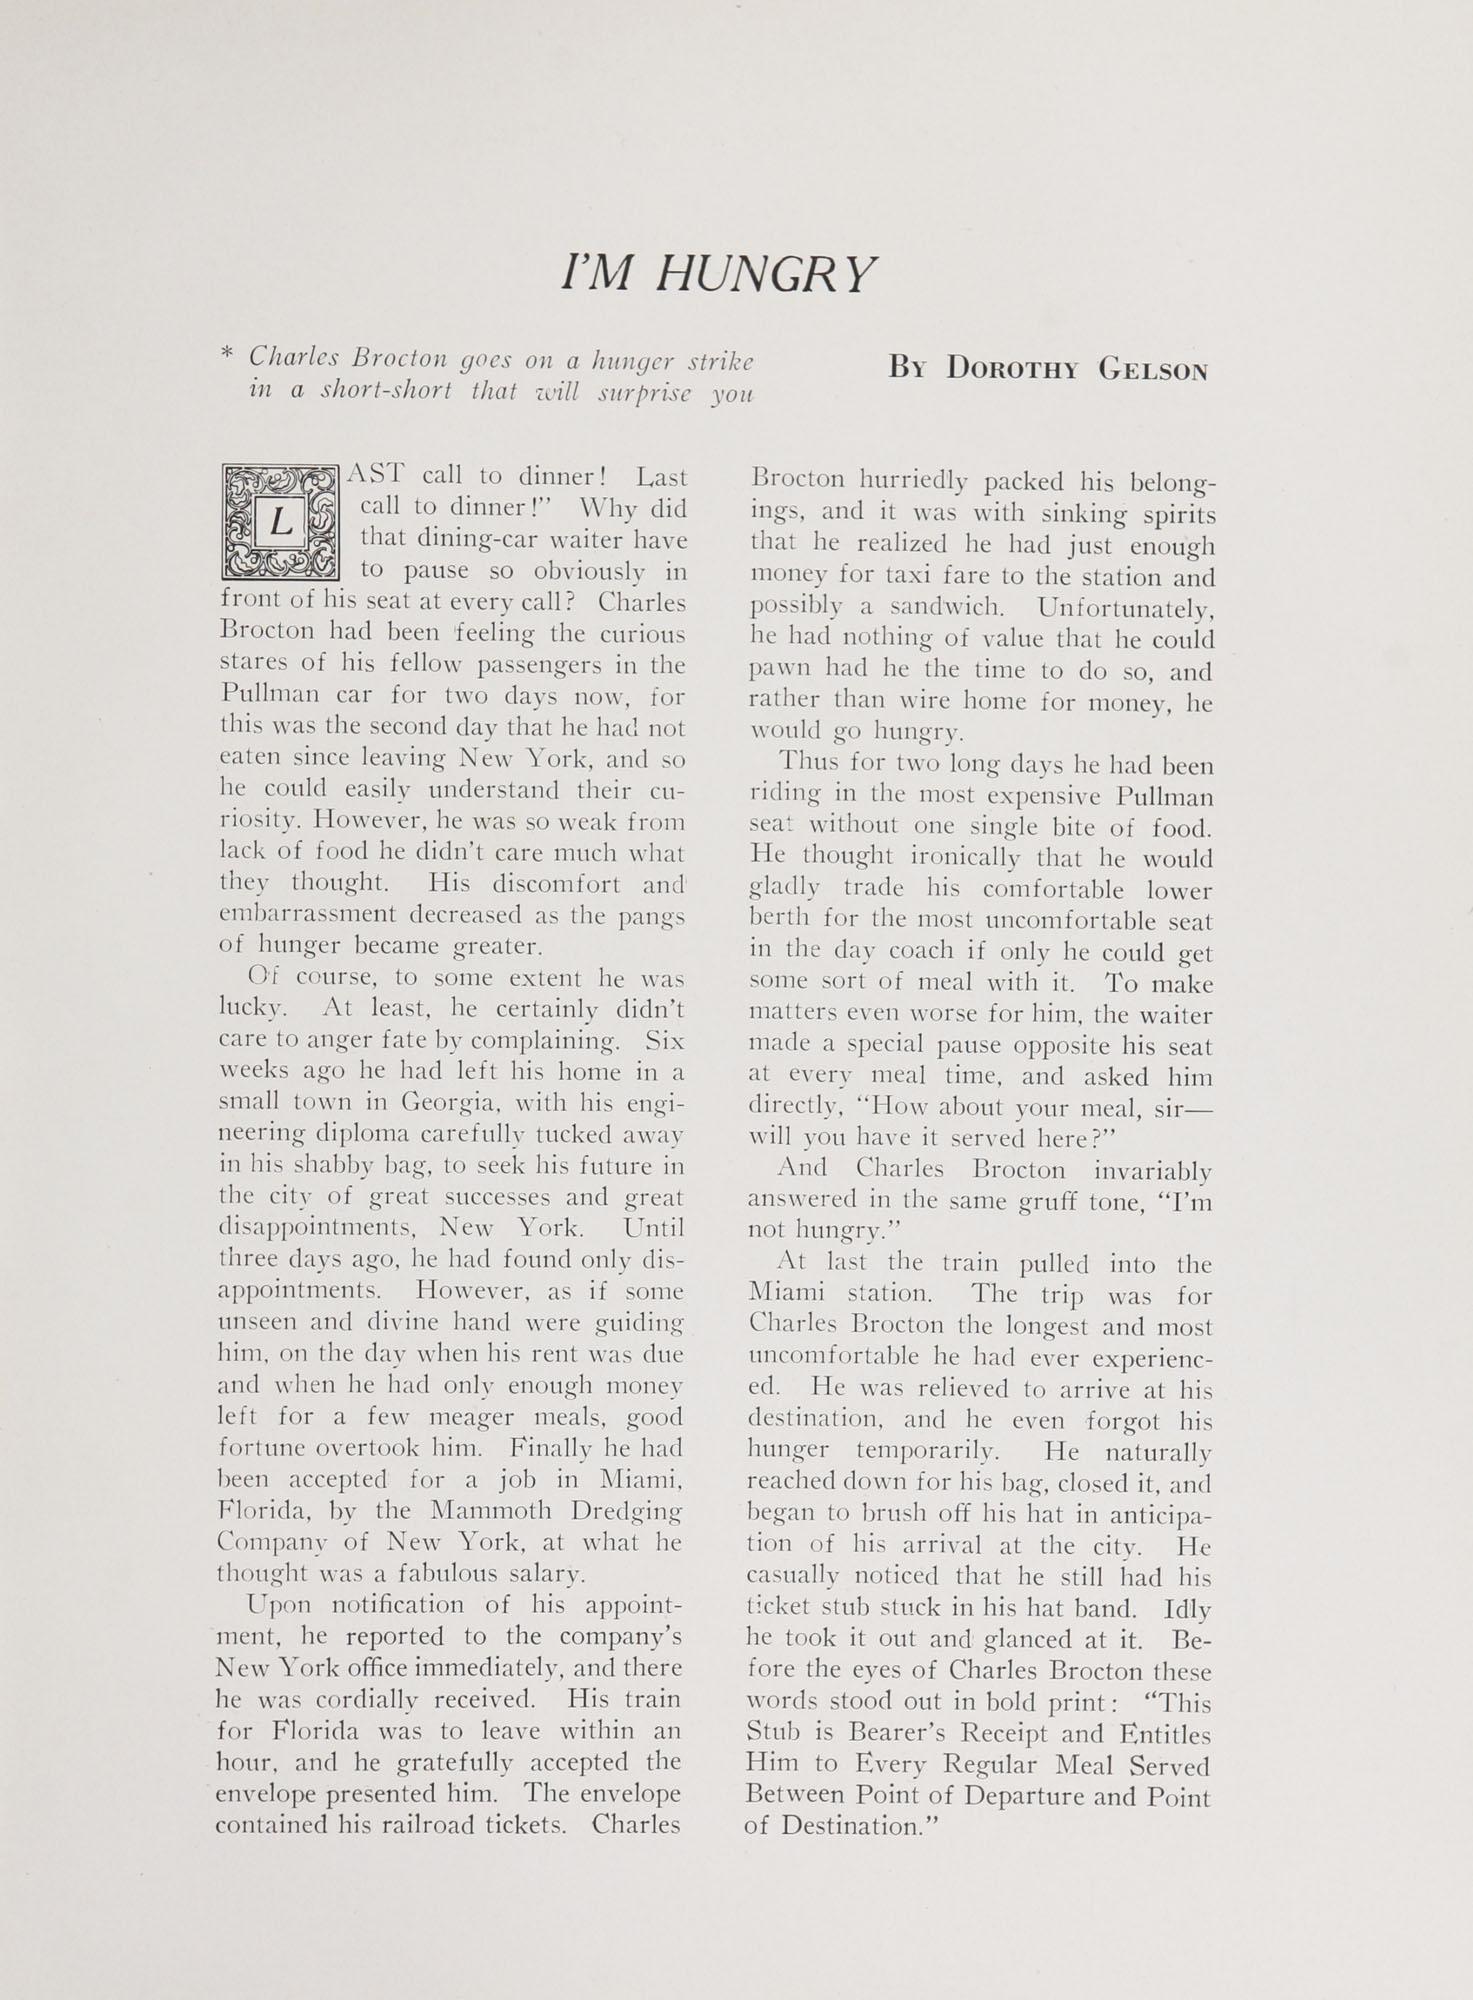 College of Charleston Magazine, 1938-1939, Vol. XXXXII No. 1, page 13